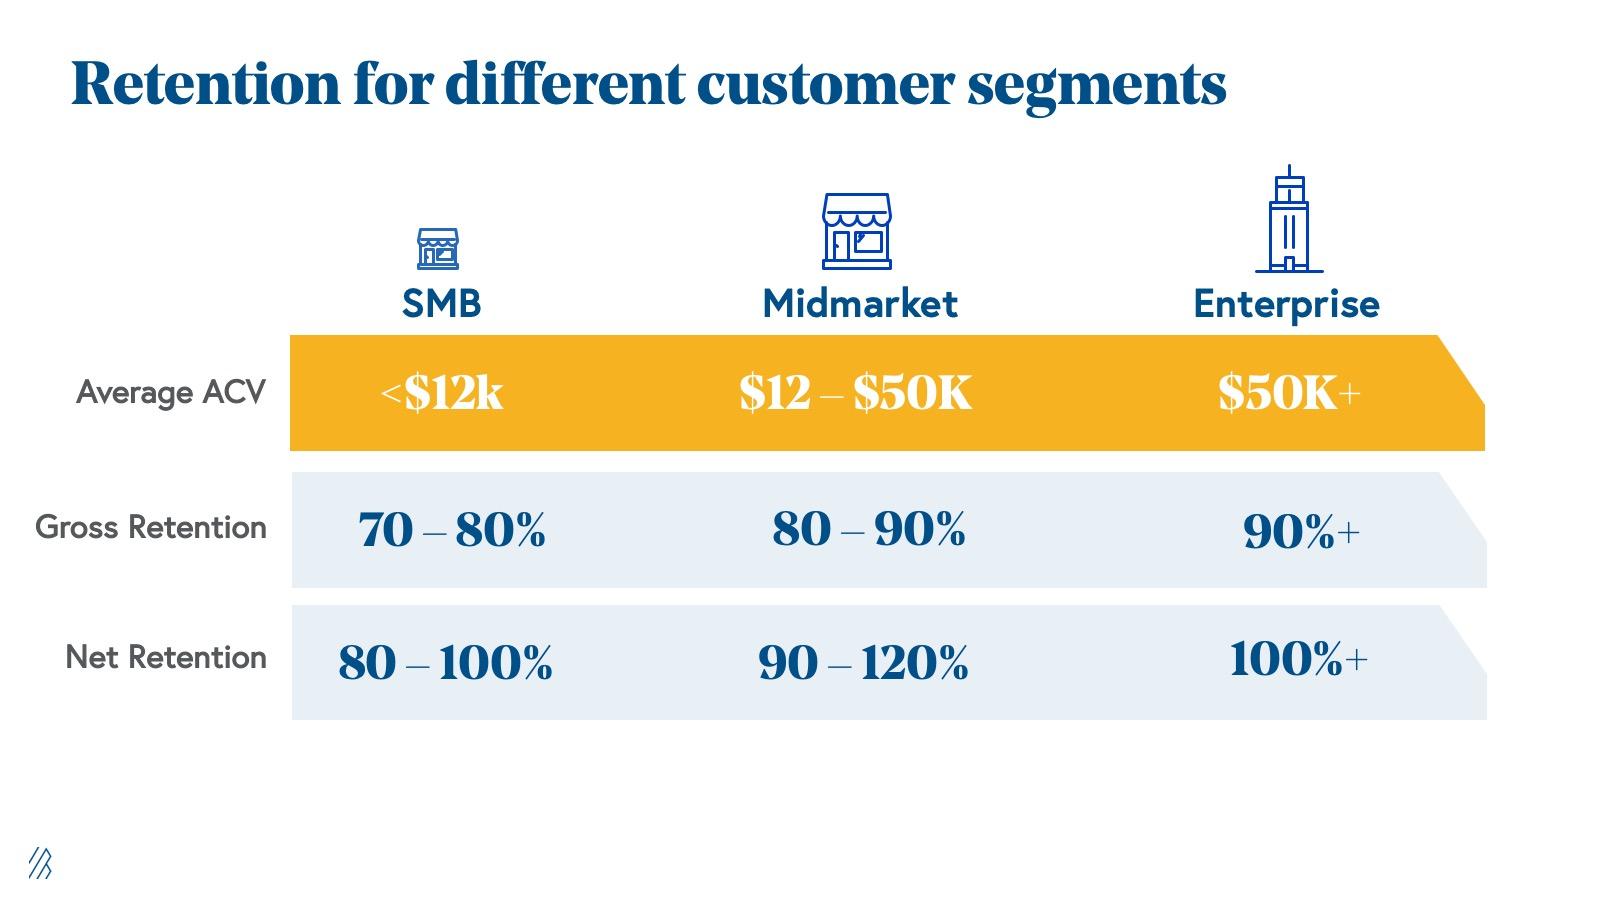 Retention for different customer segments.